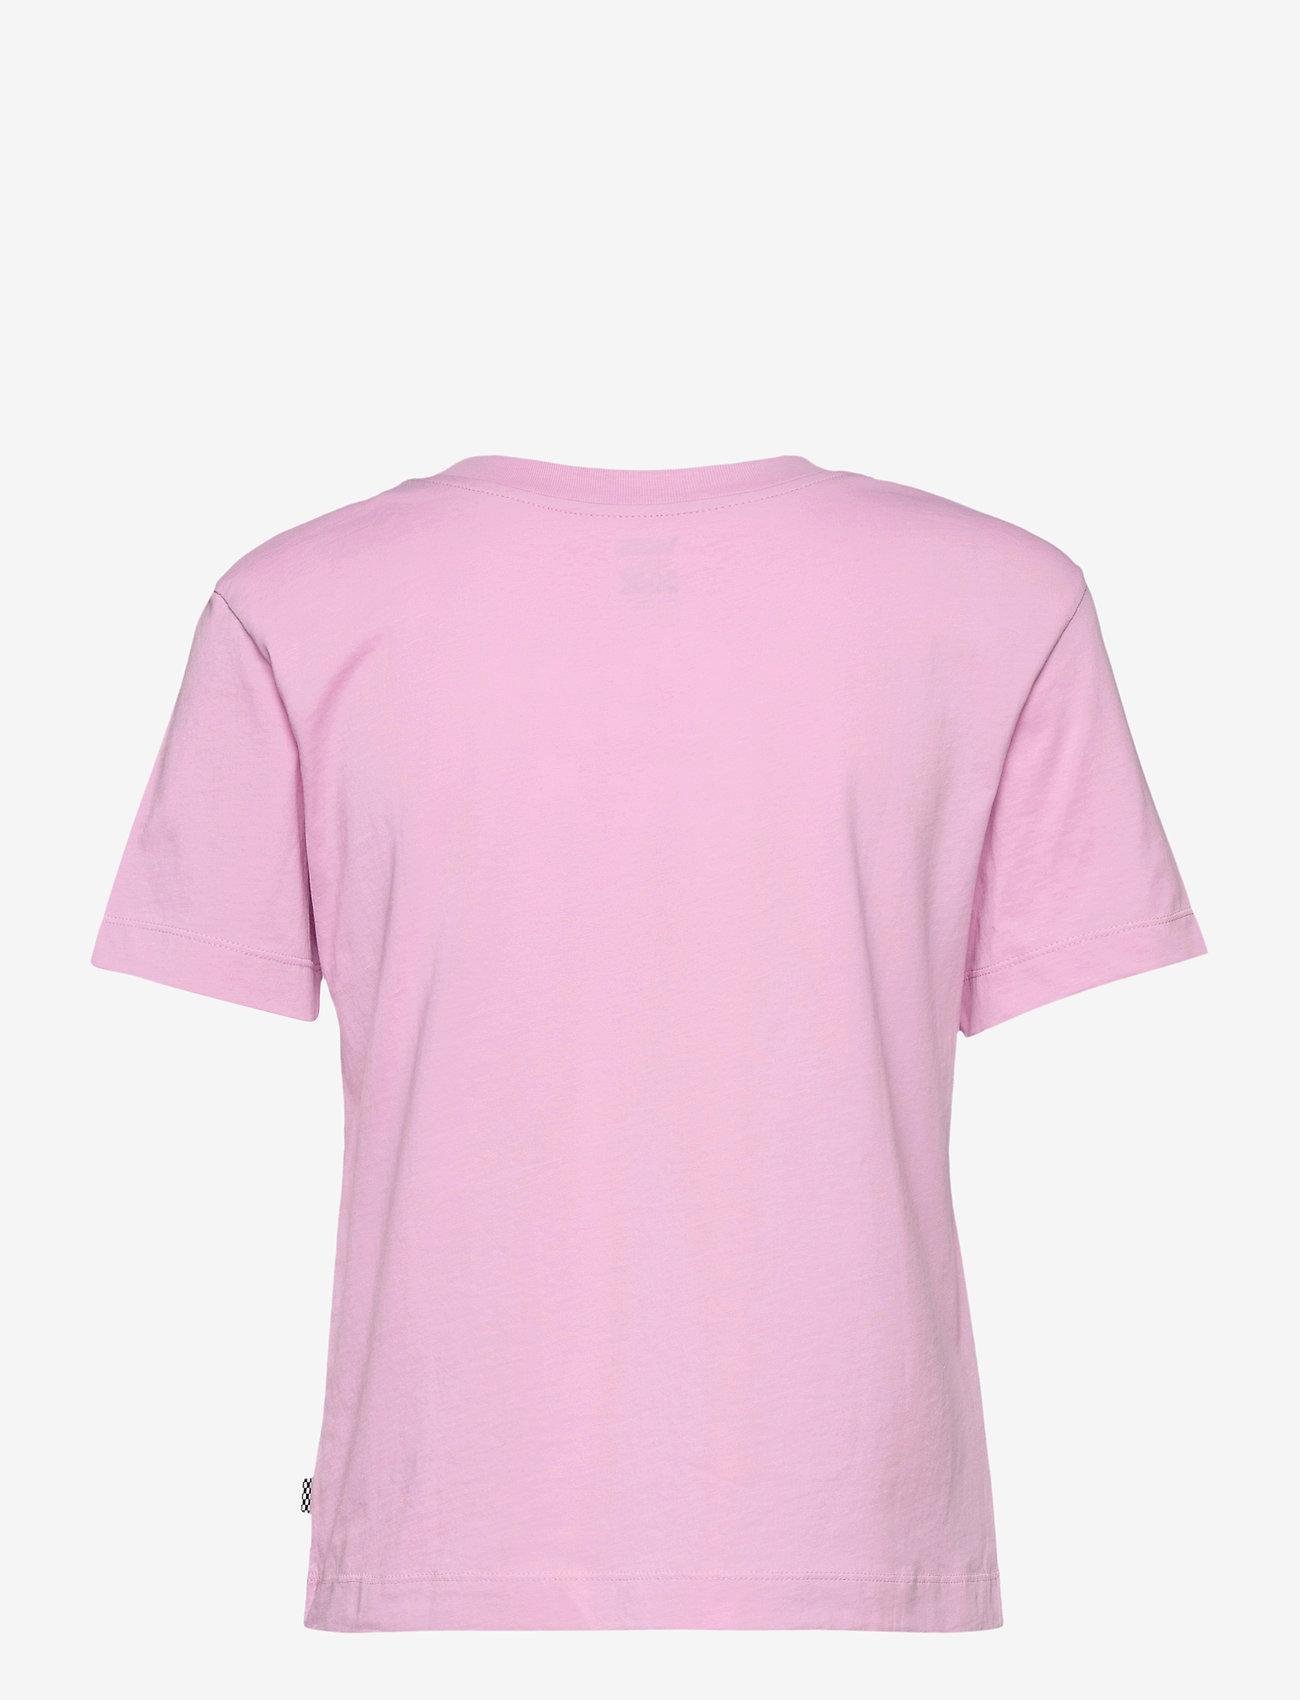 VANS - JUNIOR V BOXY - t-shirts - orchid - 1